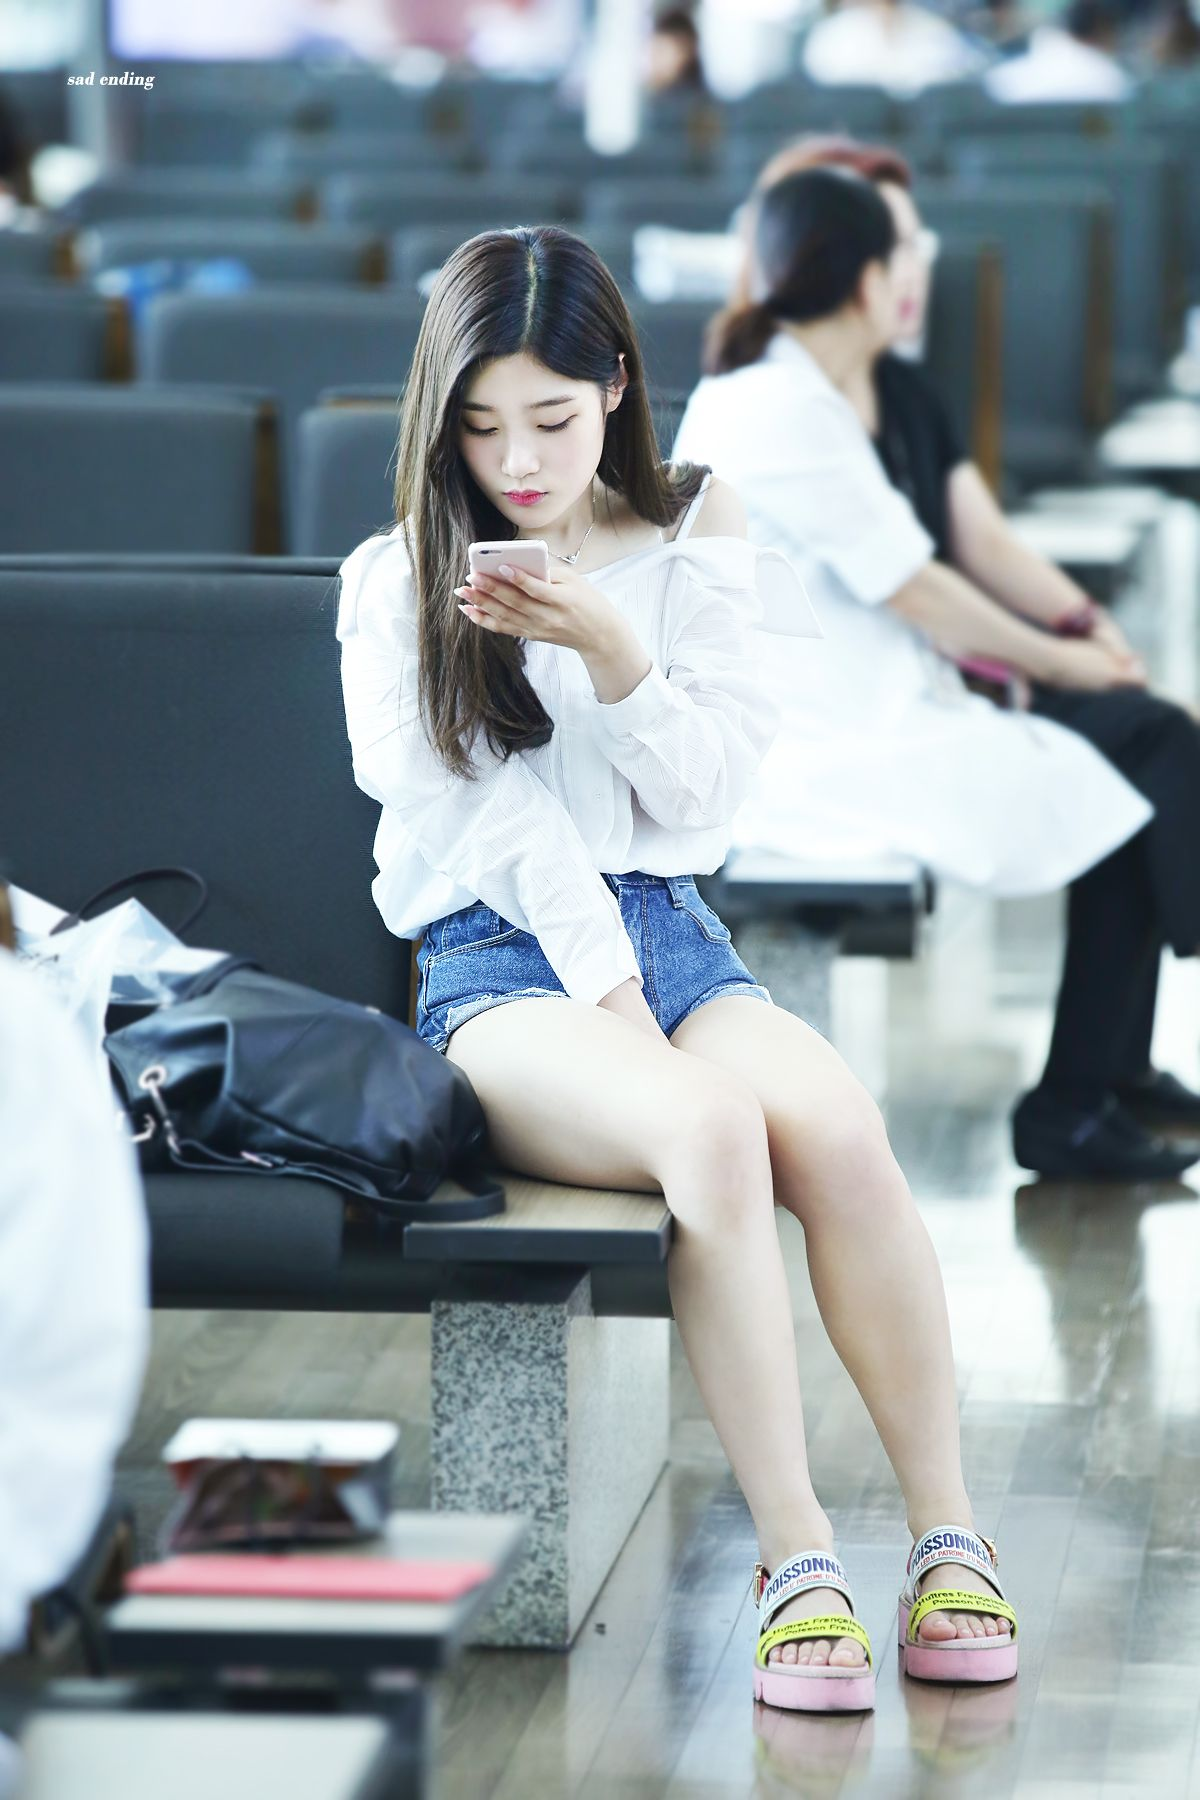 Chaeyeon Kpics Kpop Sweetgirls Lovethem Love Unsensored Girls Sweet Sexygirls Selfie Women Ulzzang Girl Kpop Girls Jung Chaeyeon